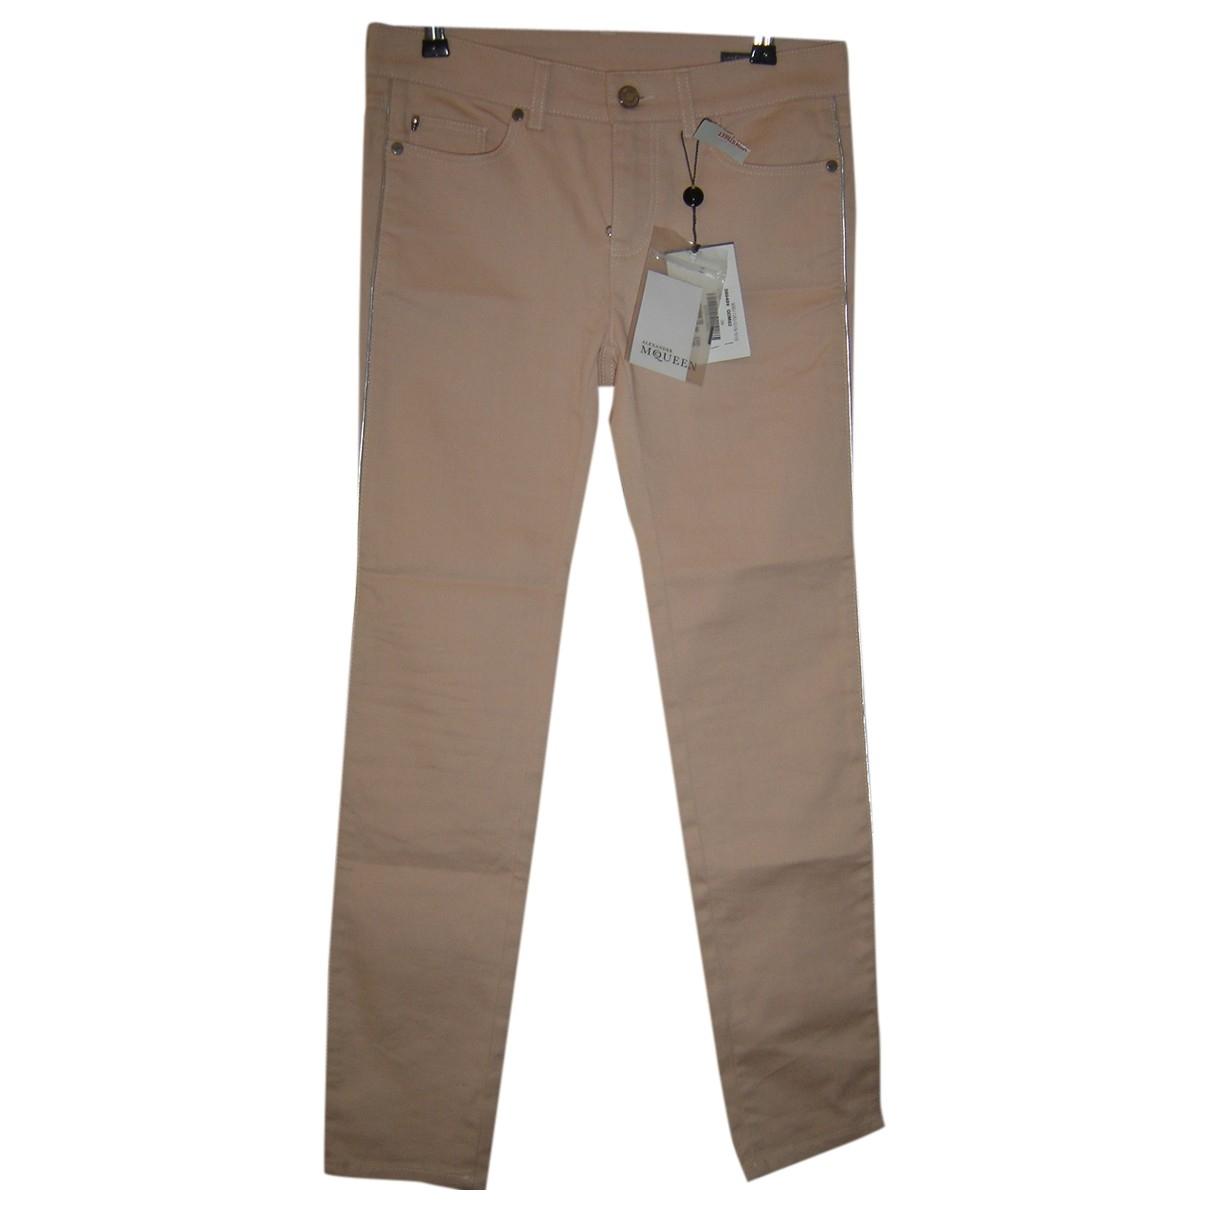 Alexander Mcqueen \N Cotton Trousers for Women S International